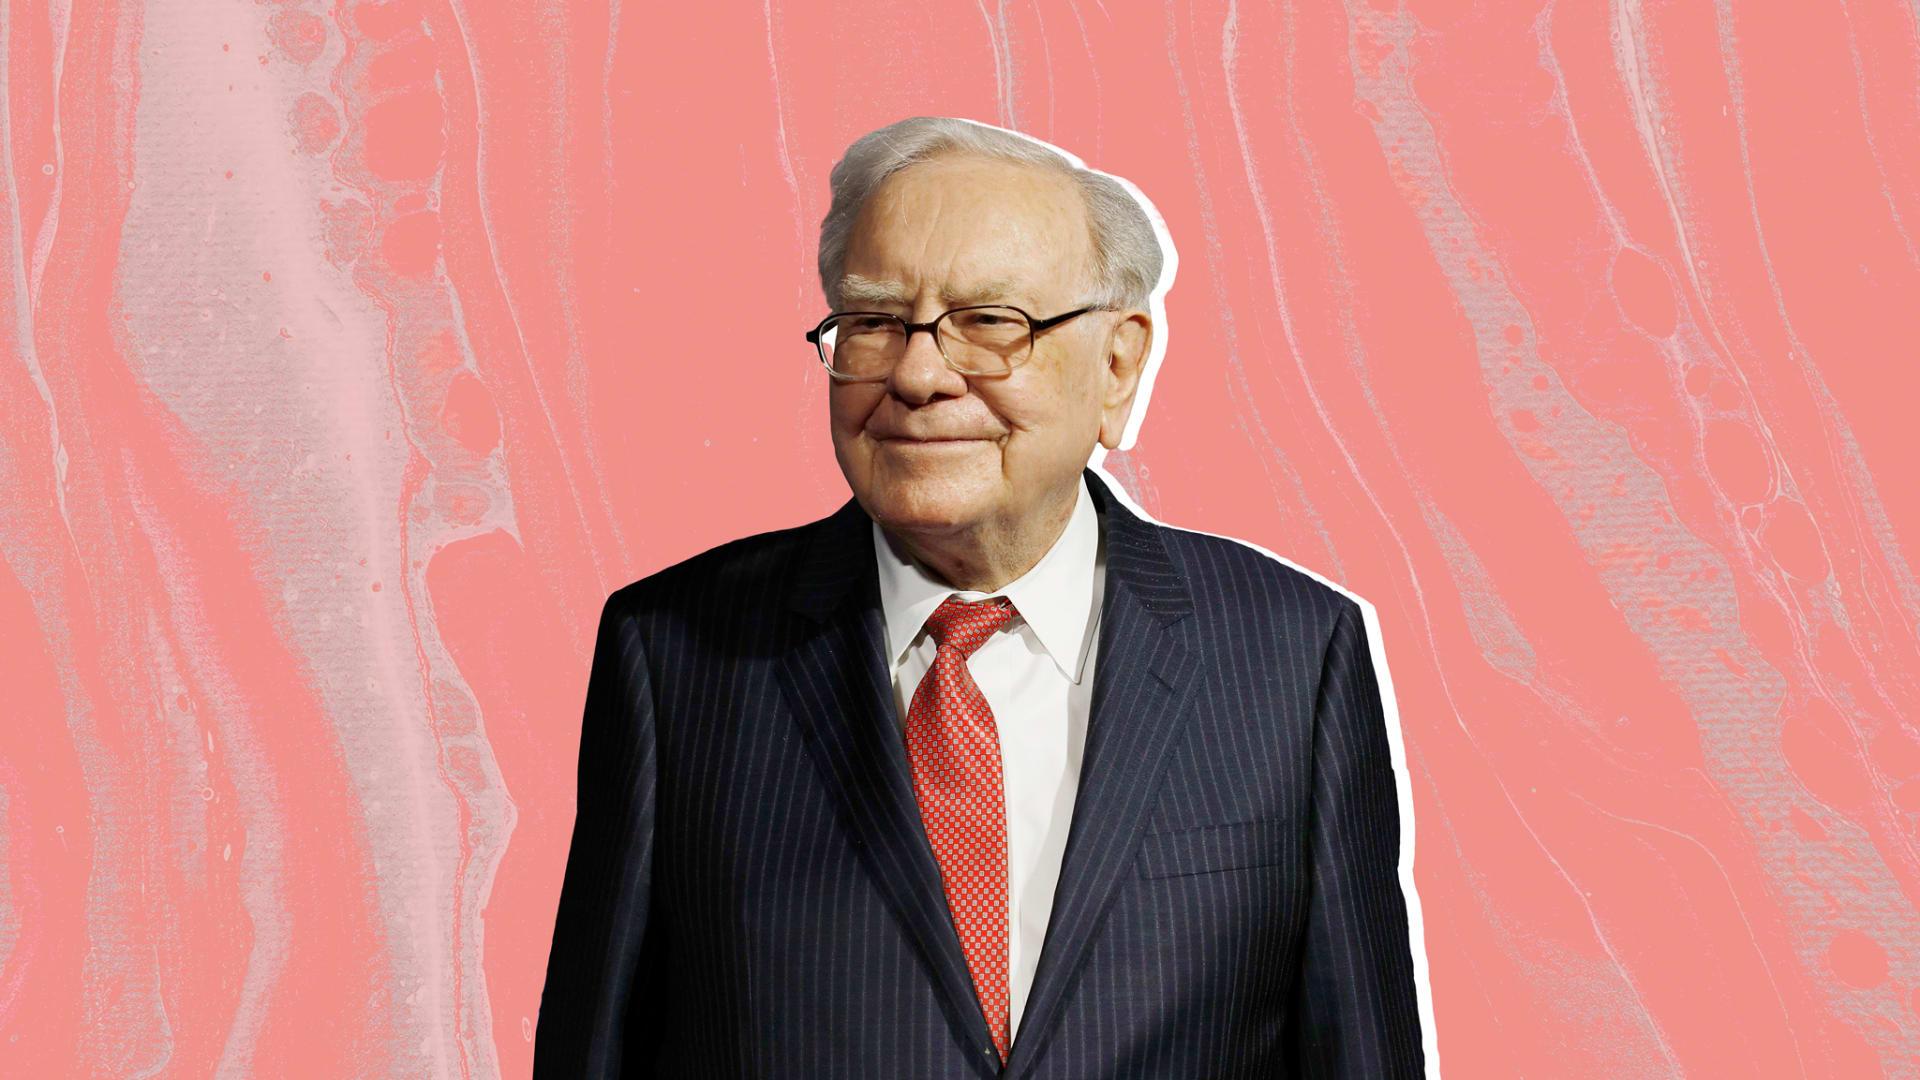 Warren Buffett Explains How 1 Mistake Could Ruin Your Reputation